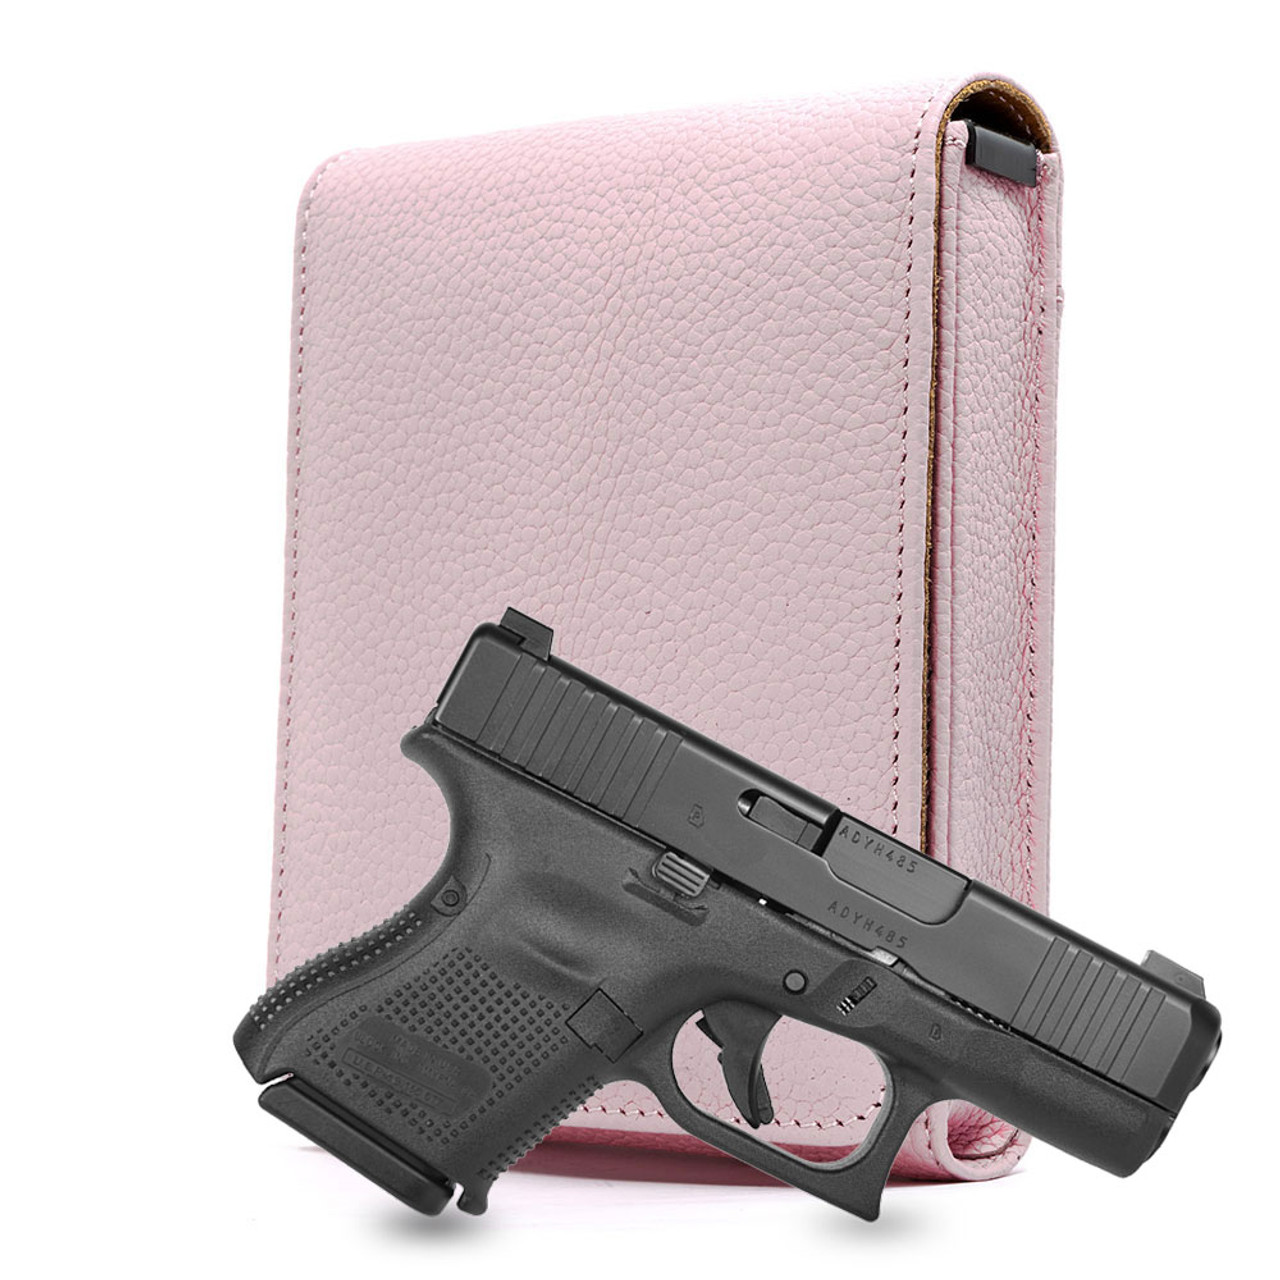 Glock 26 Pink Carry Faithfully Cross Holster